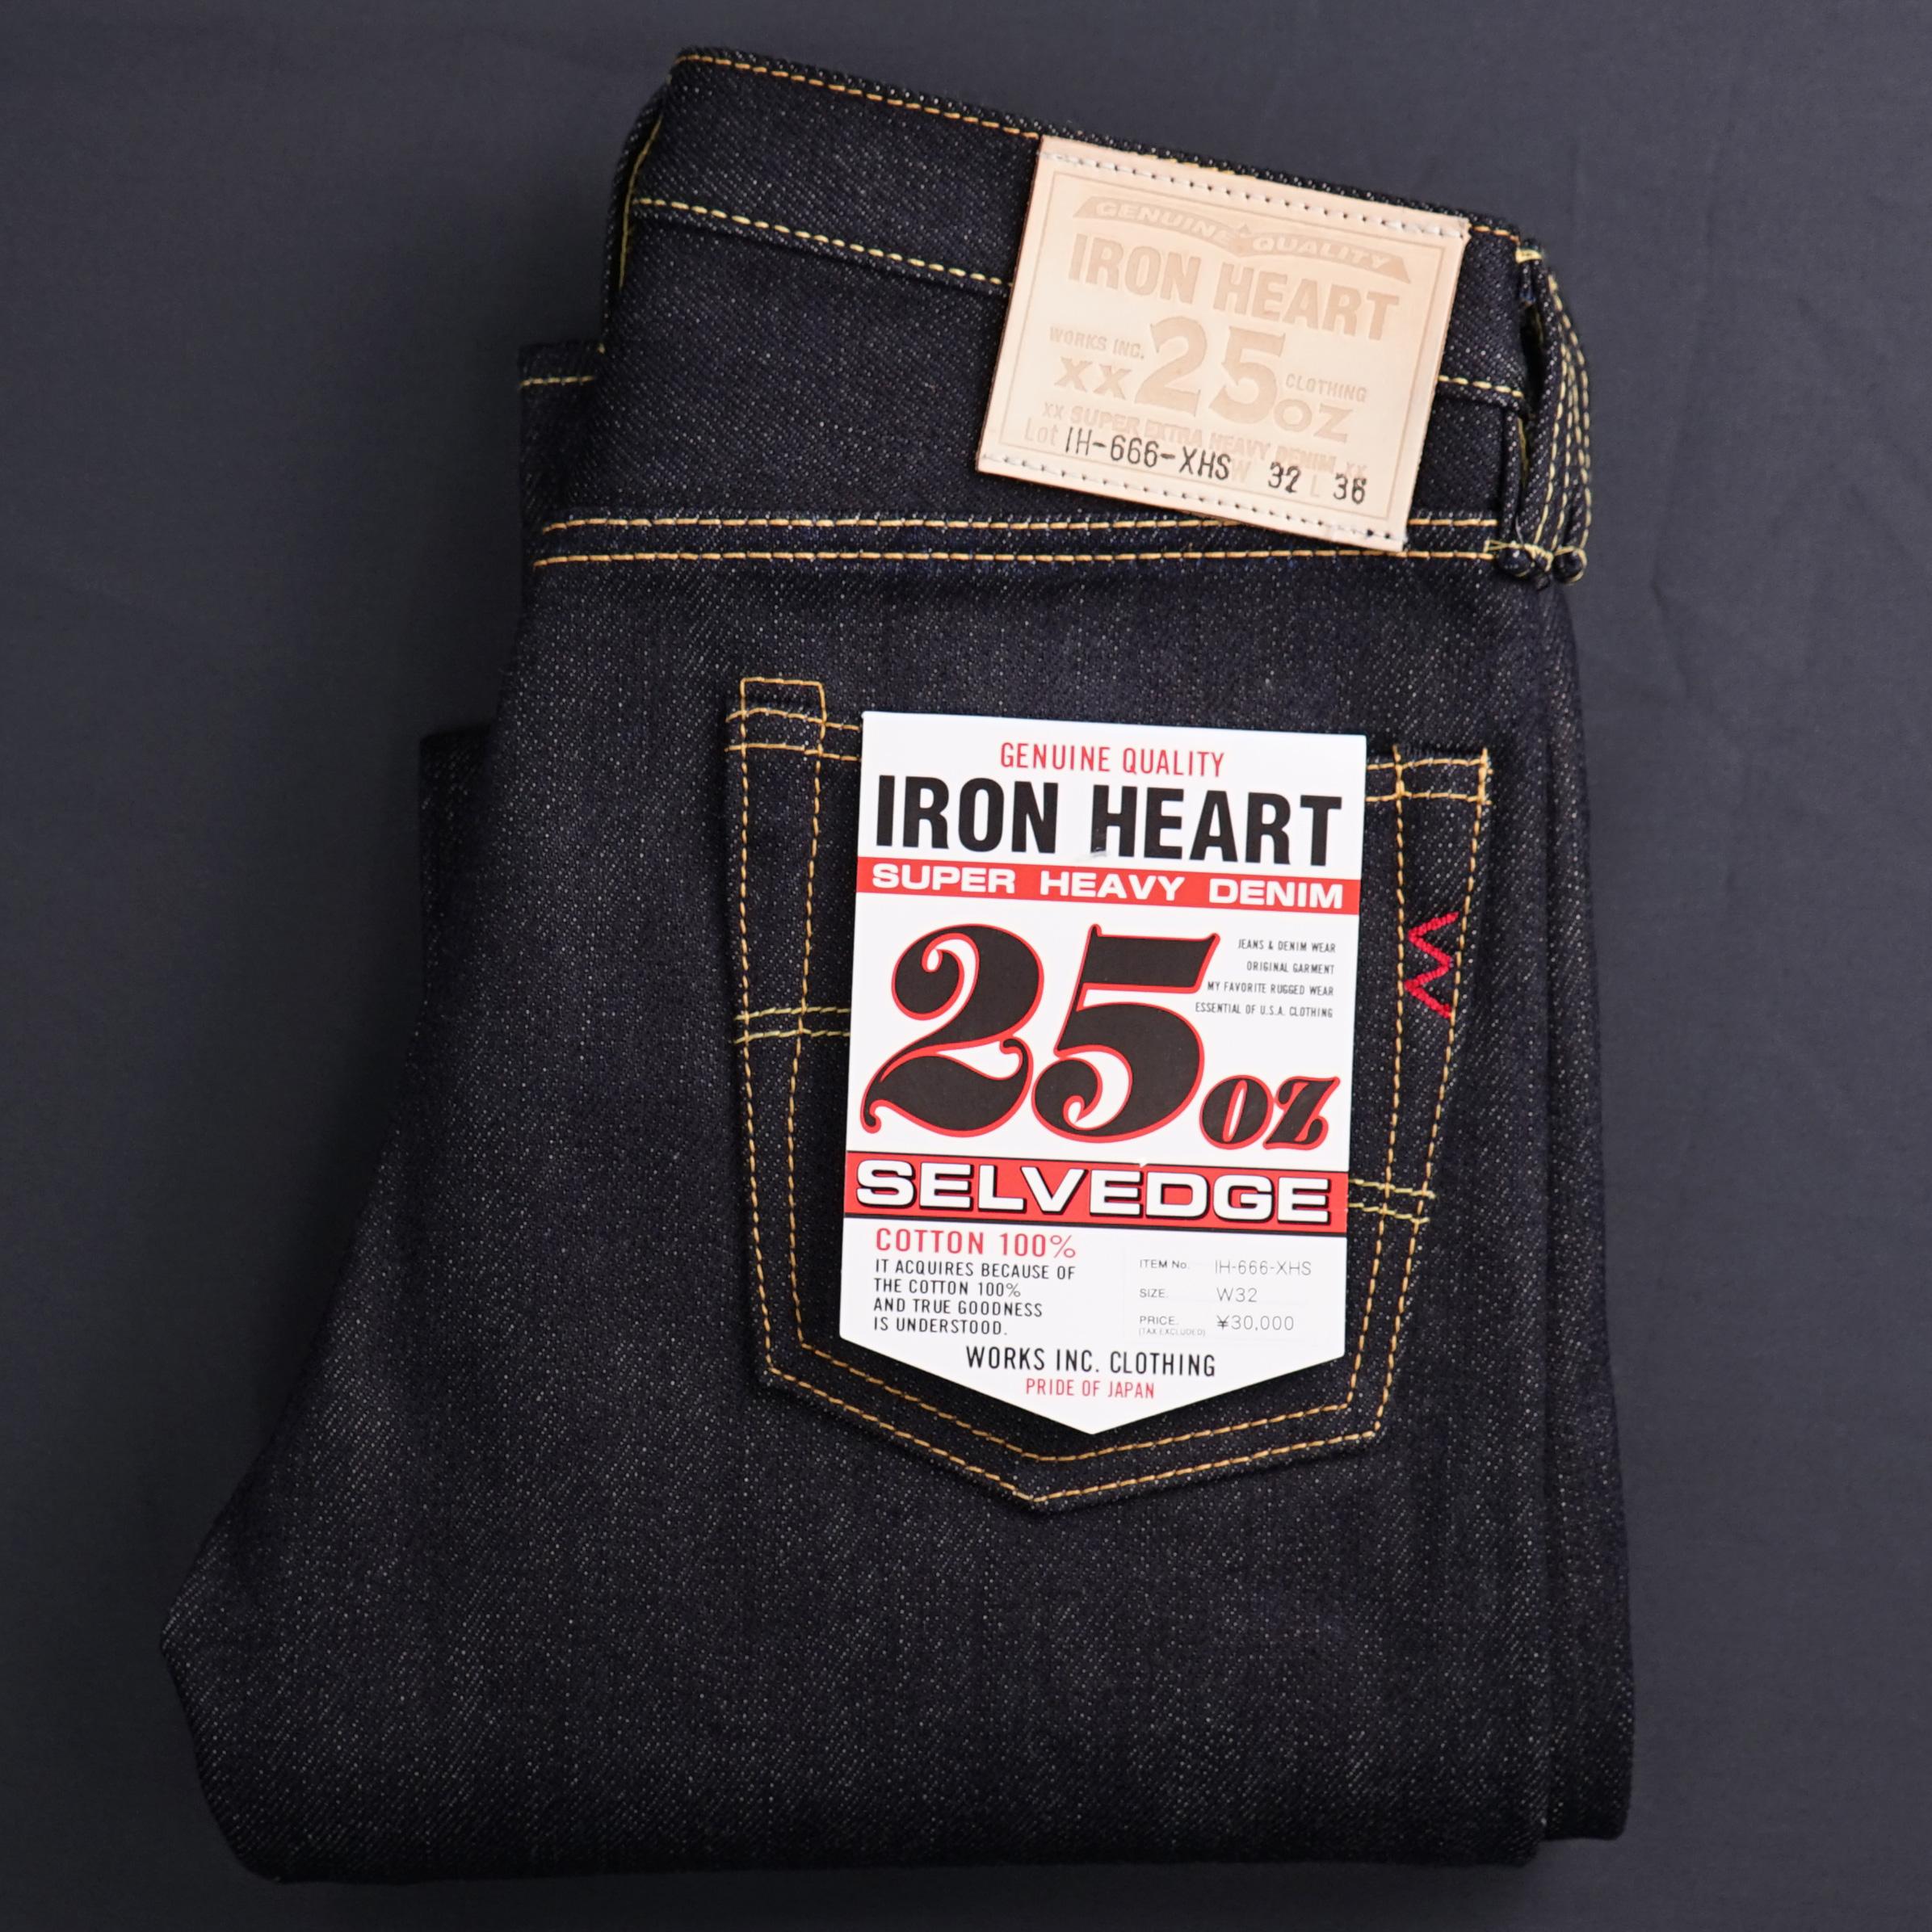 Iron Heart IH-666-XHS 25 Oz Selvedge Indigo